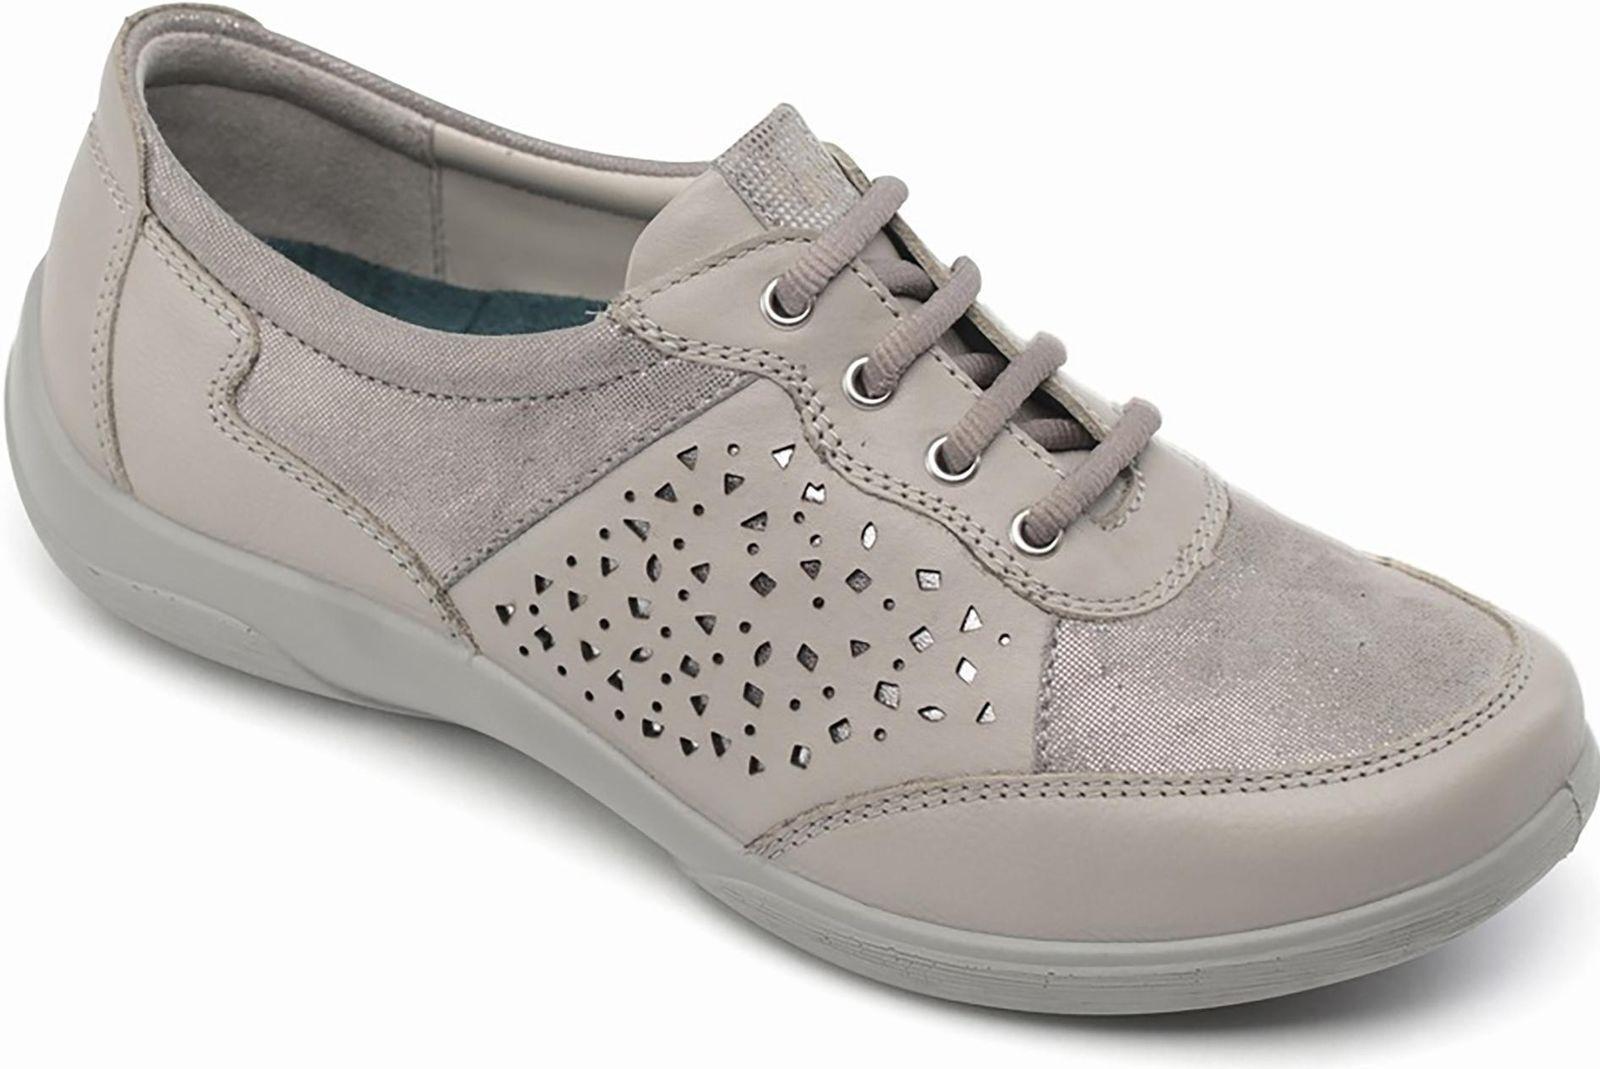 Padders Padders Padders mujer Zapatos Con Cordones ' Arpa '  Compra calidad 100% autentica